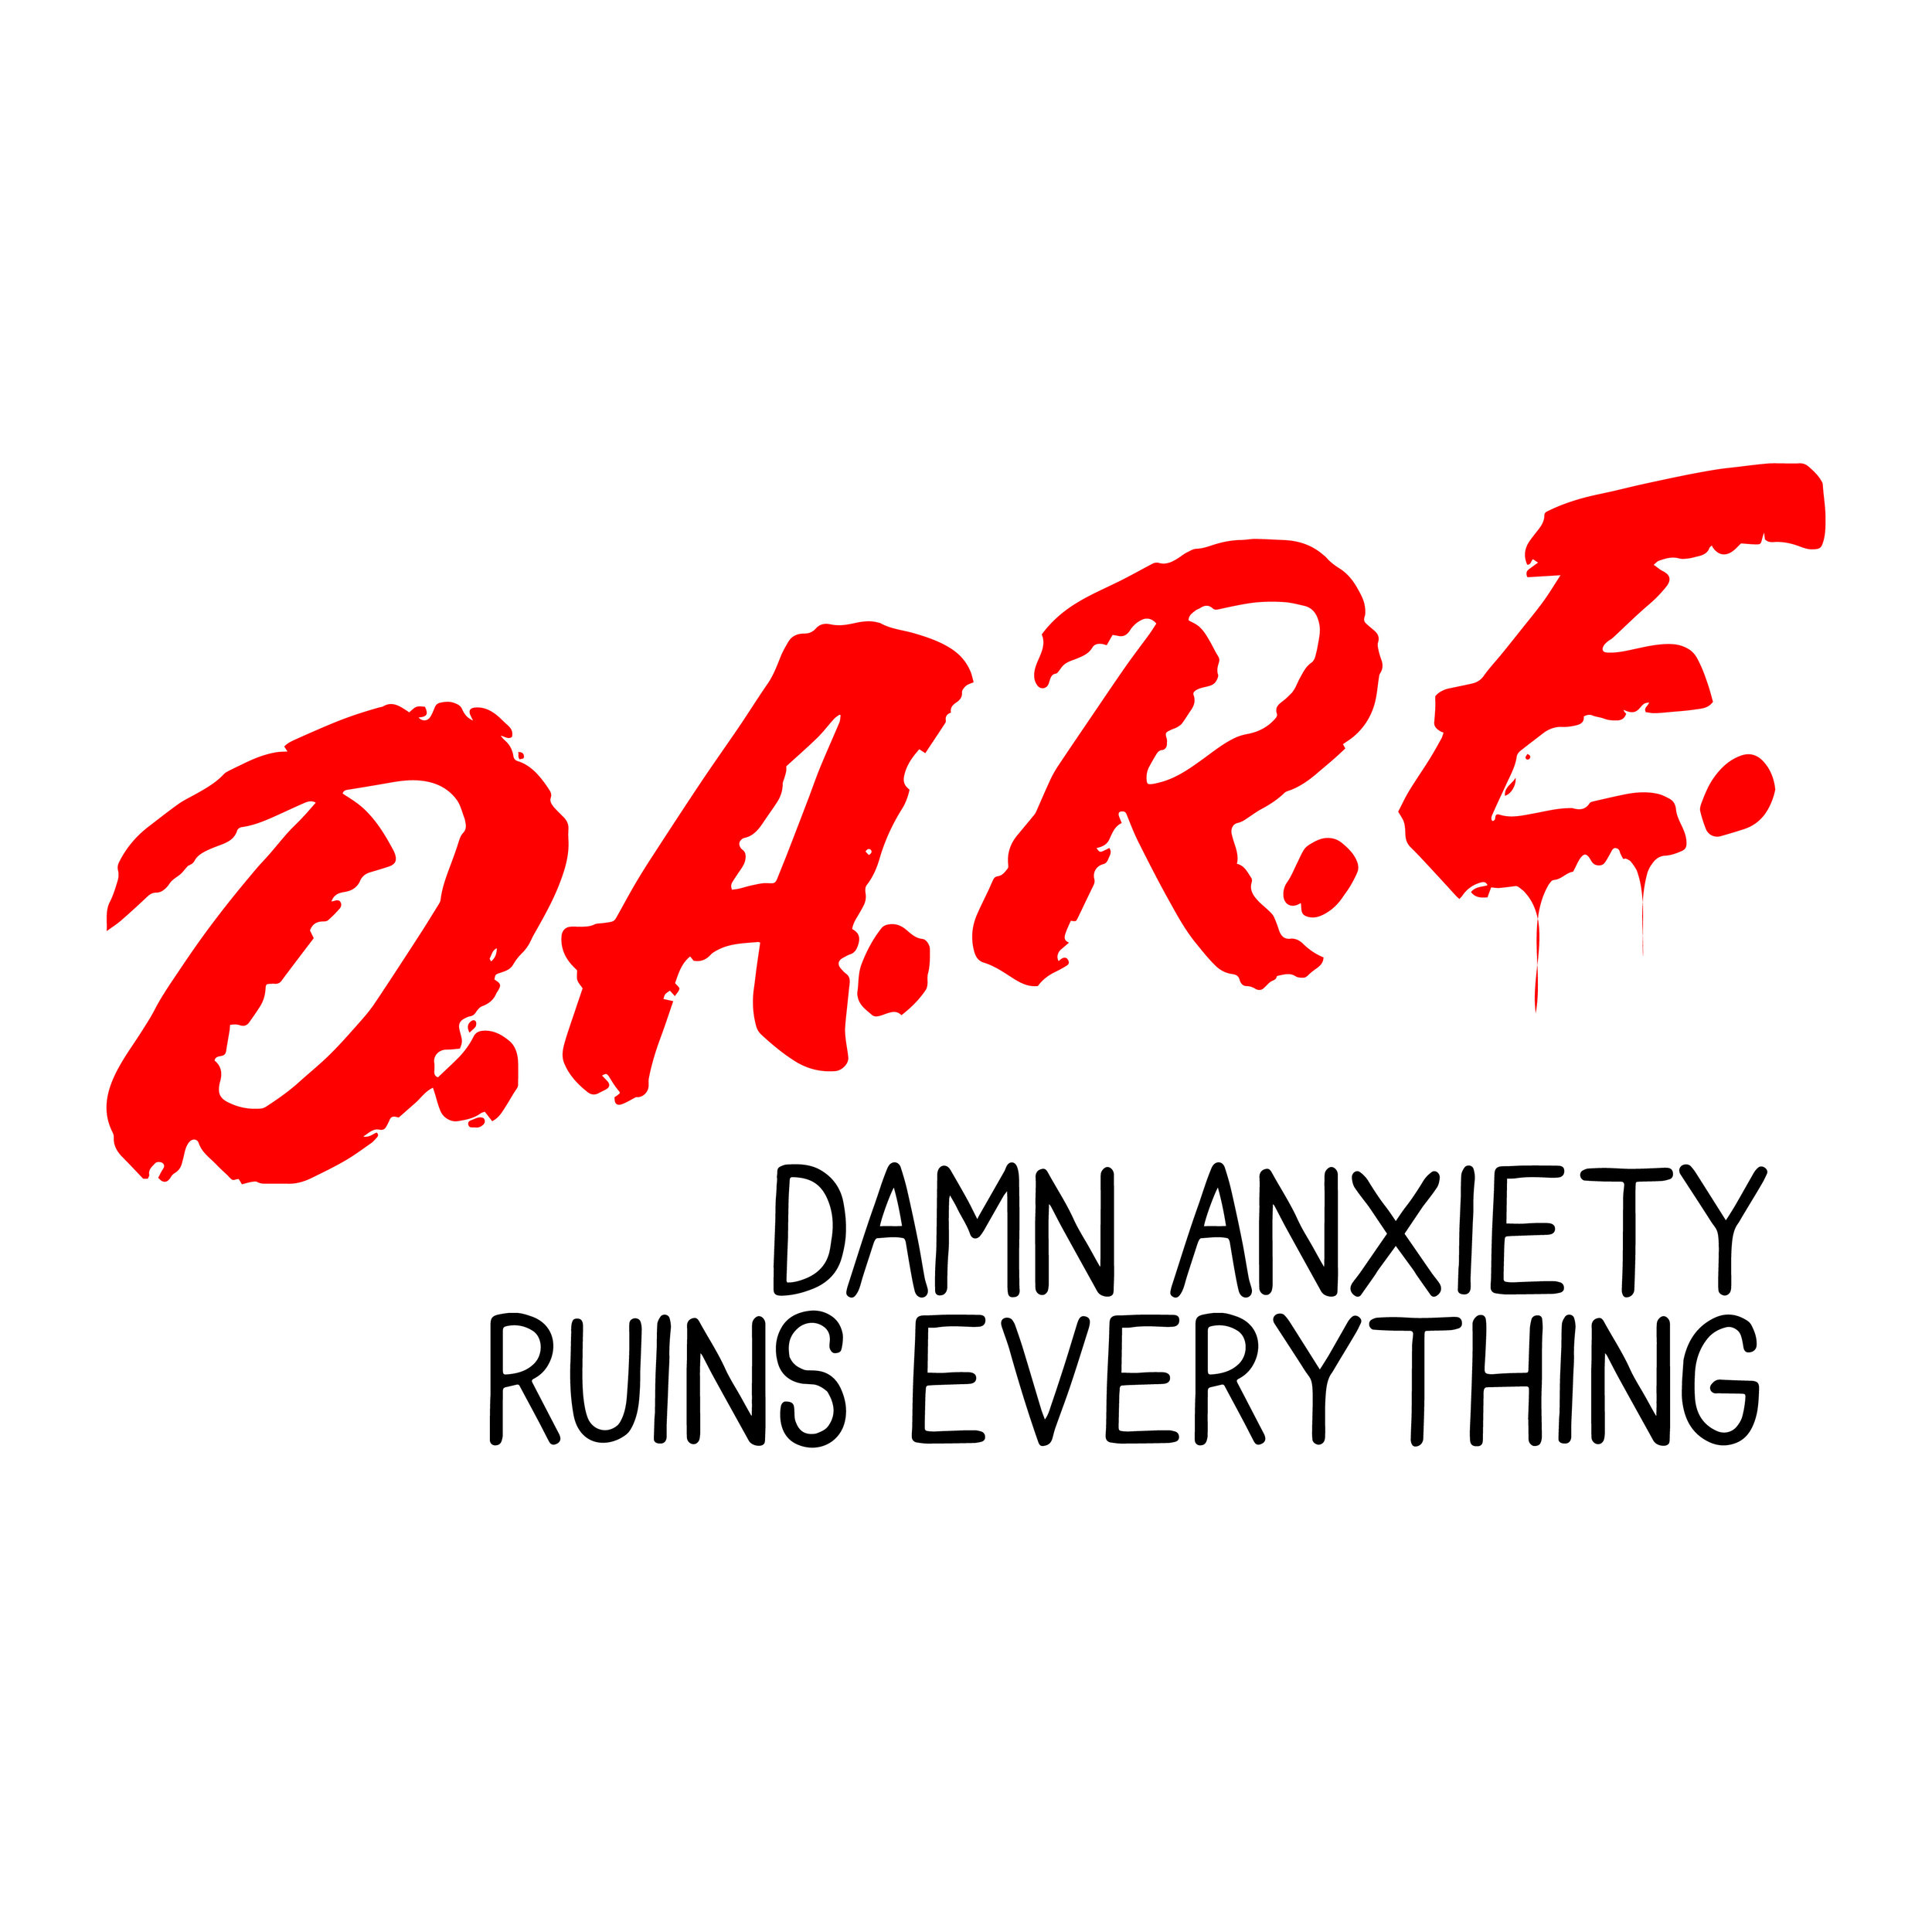 dare-01.jpg